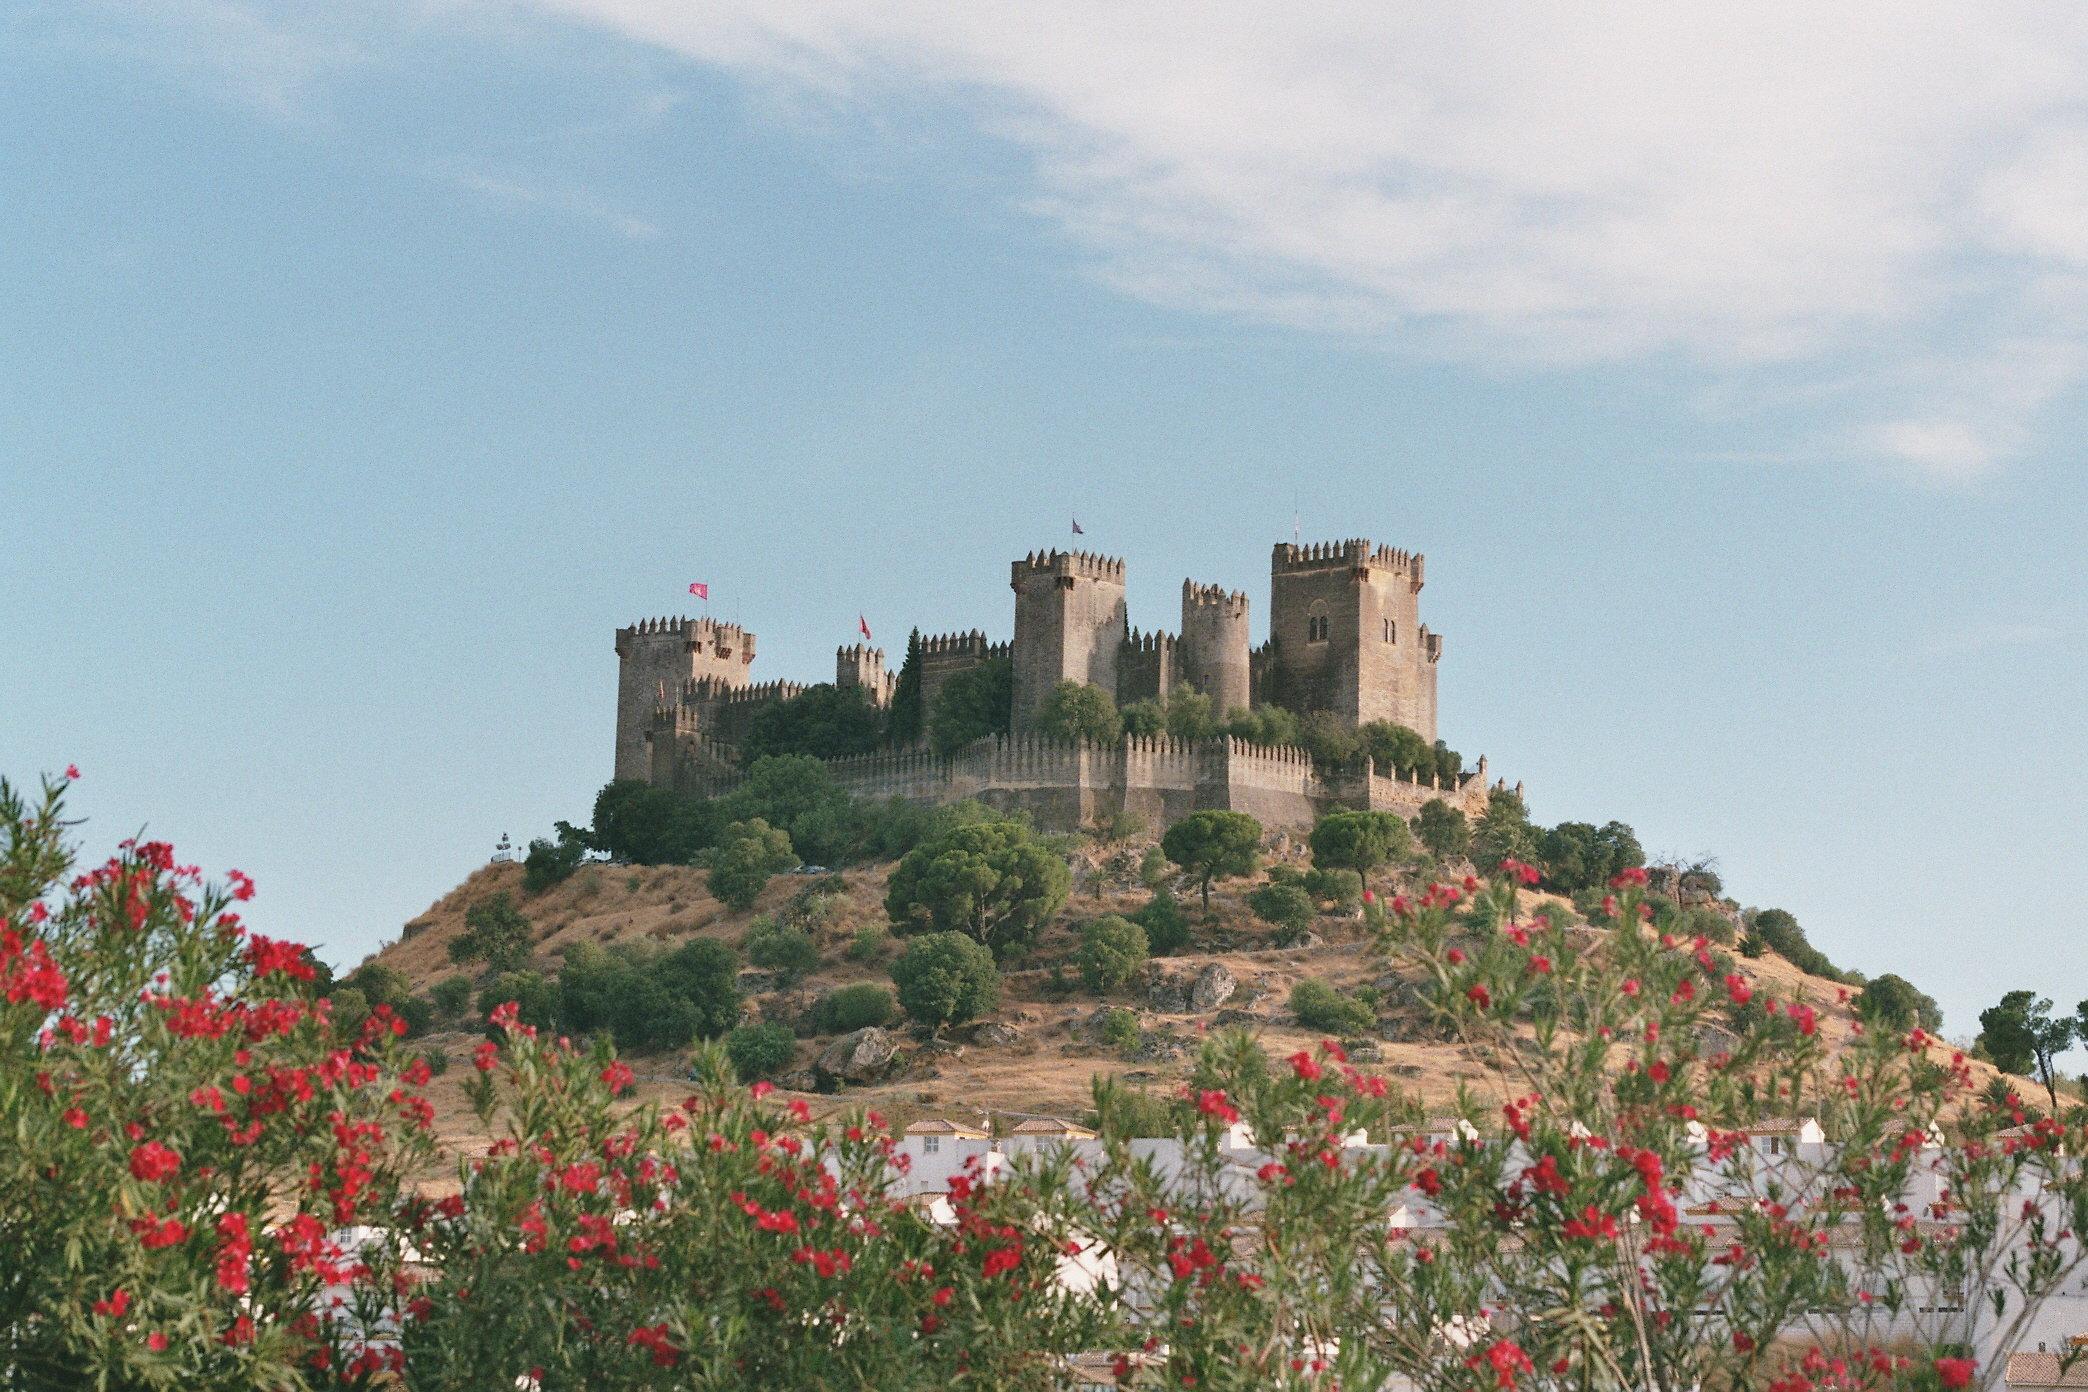 File:Castillo de Almodóvar del Río 2009.jpg - Wikimedia Commons